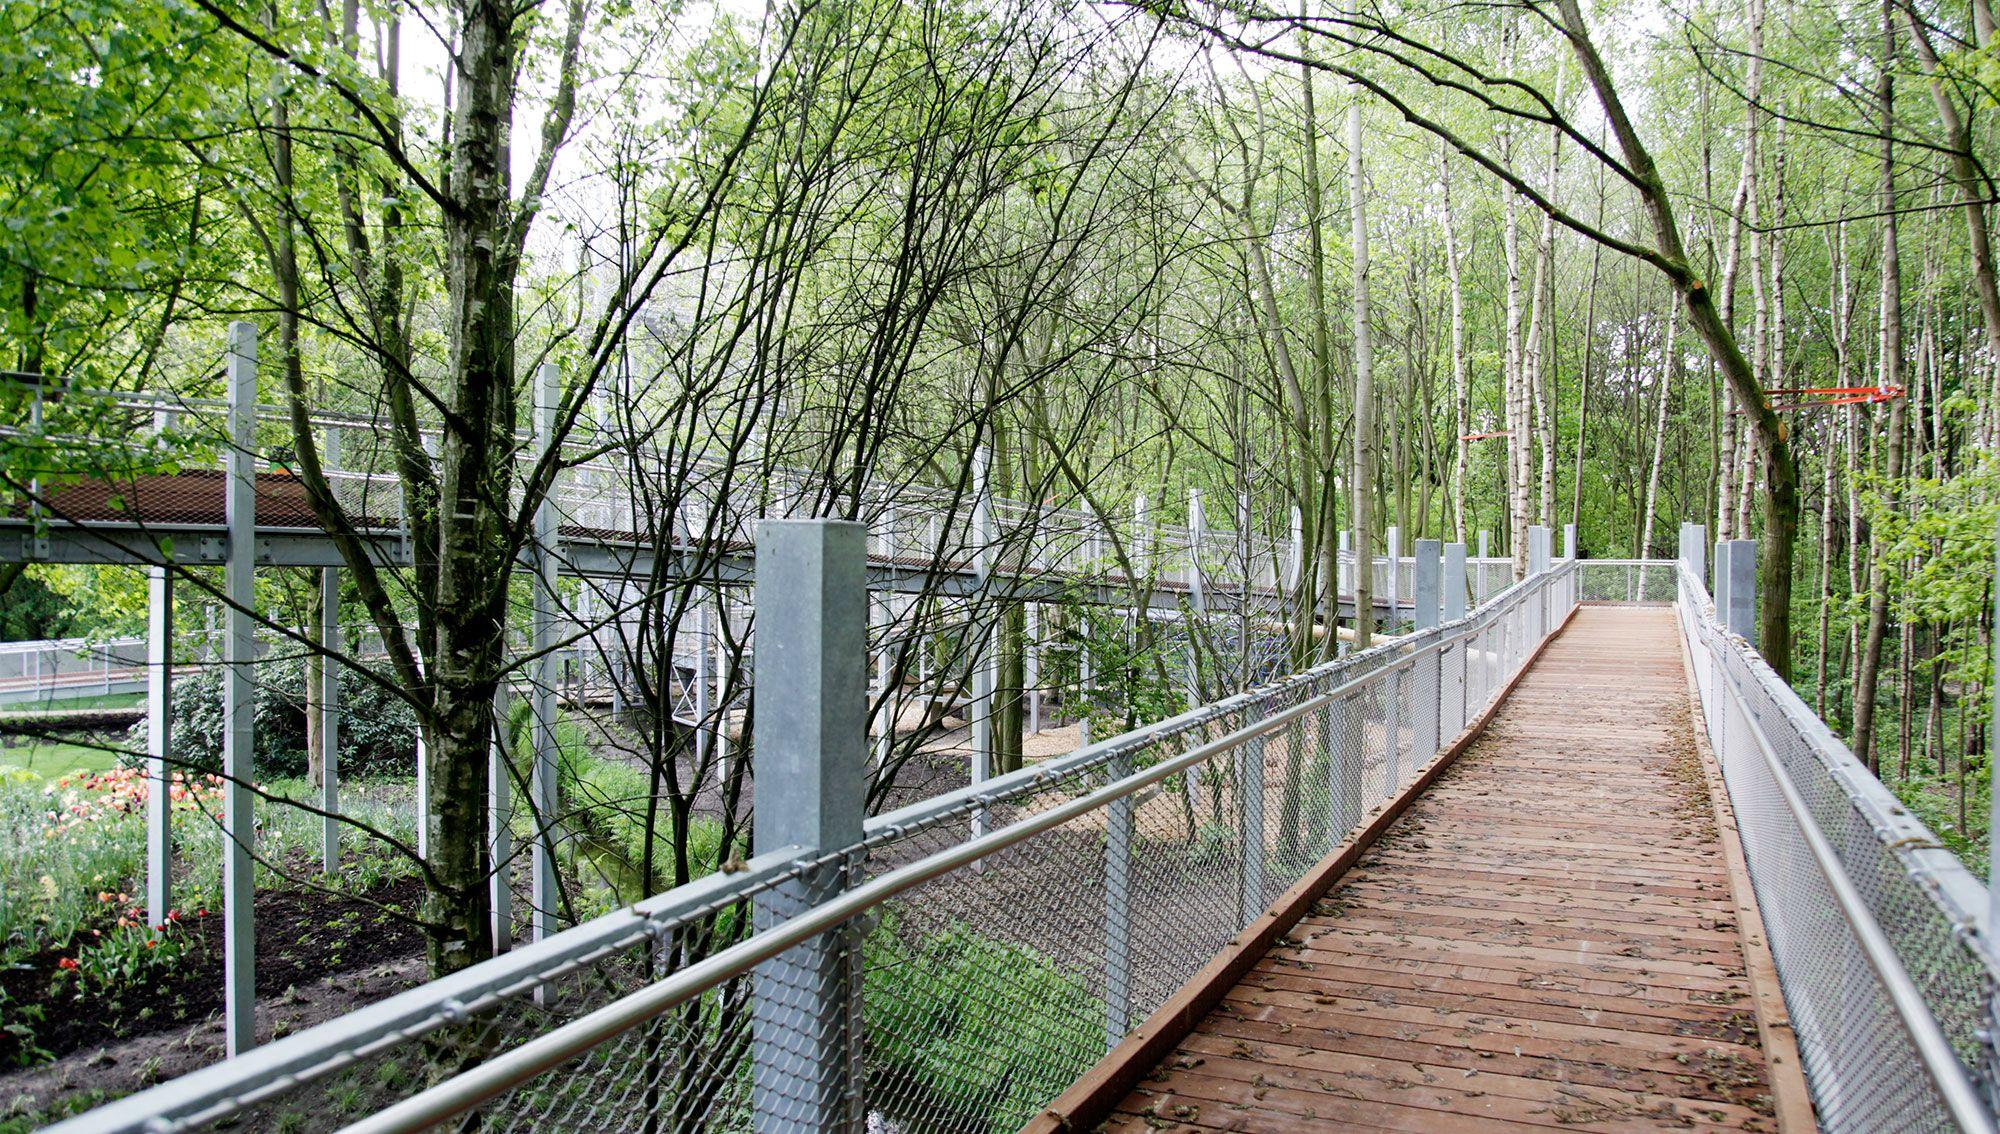 Rmp 2014 stadtpark papenburg d via rmp - Rmp landschaftsarchitekten ...